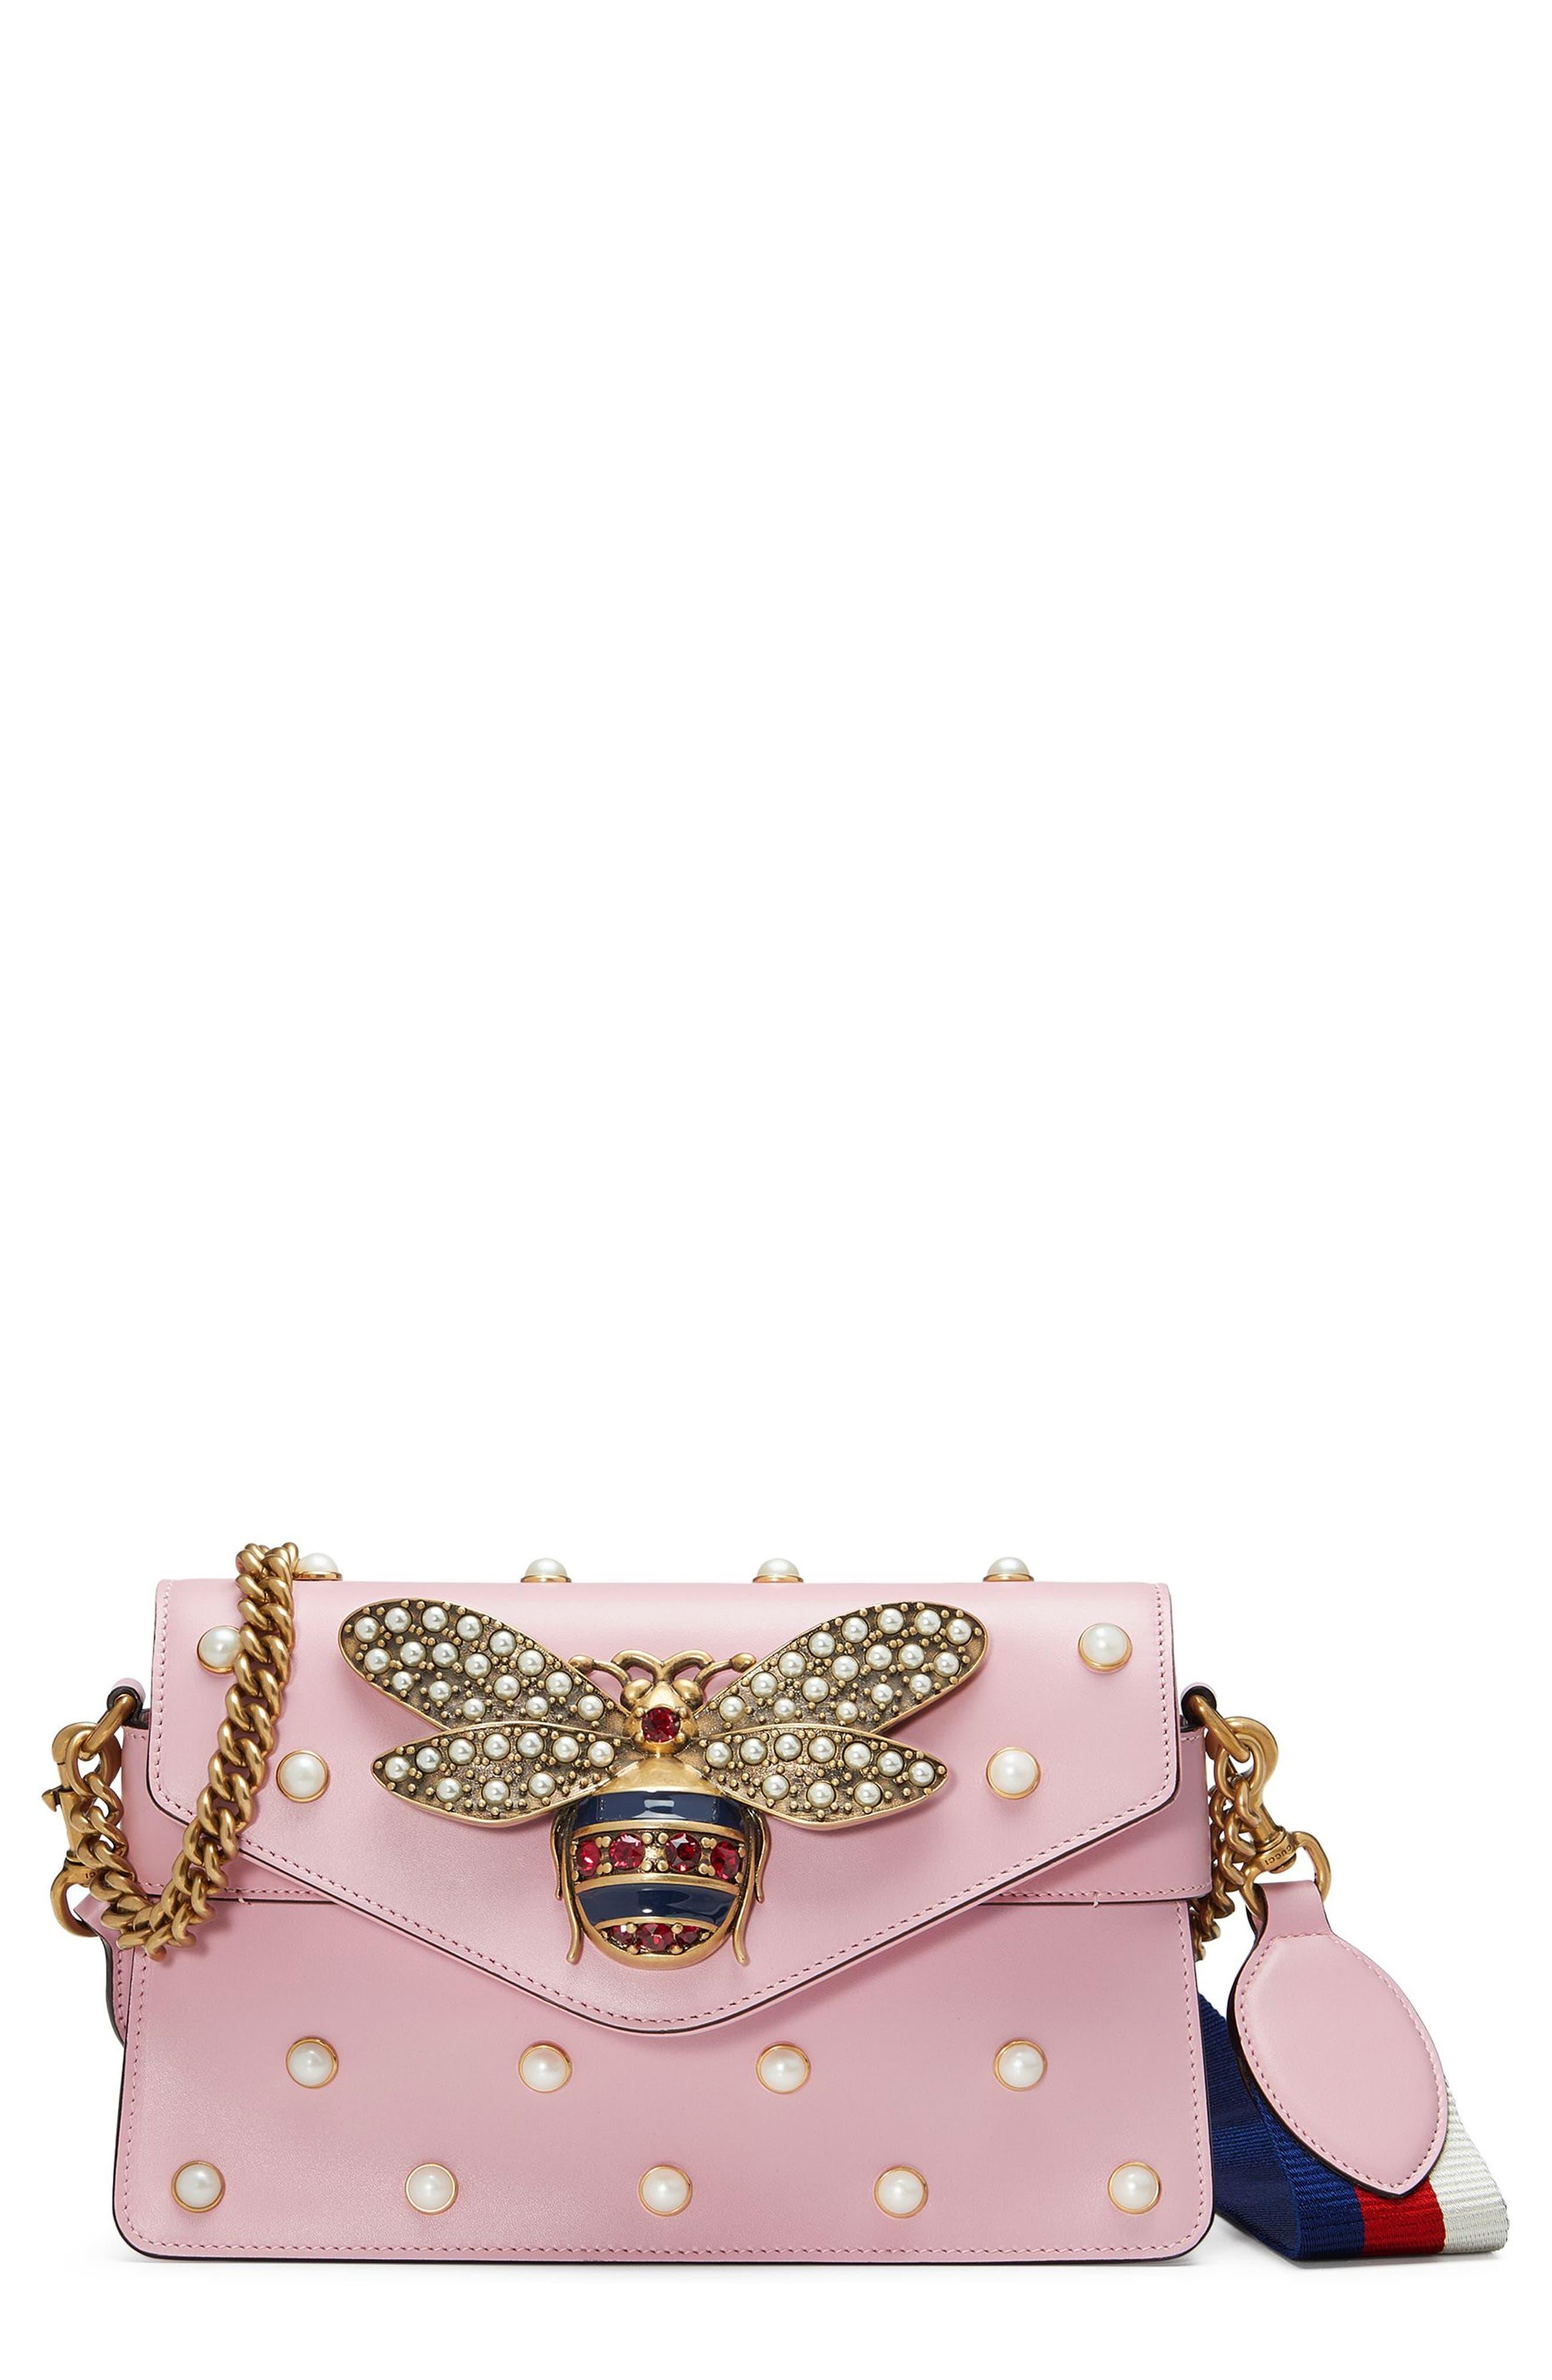 Alternate Image 1 Selected - Gucci Mini Broadway Leather Shoulder Bag